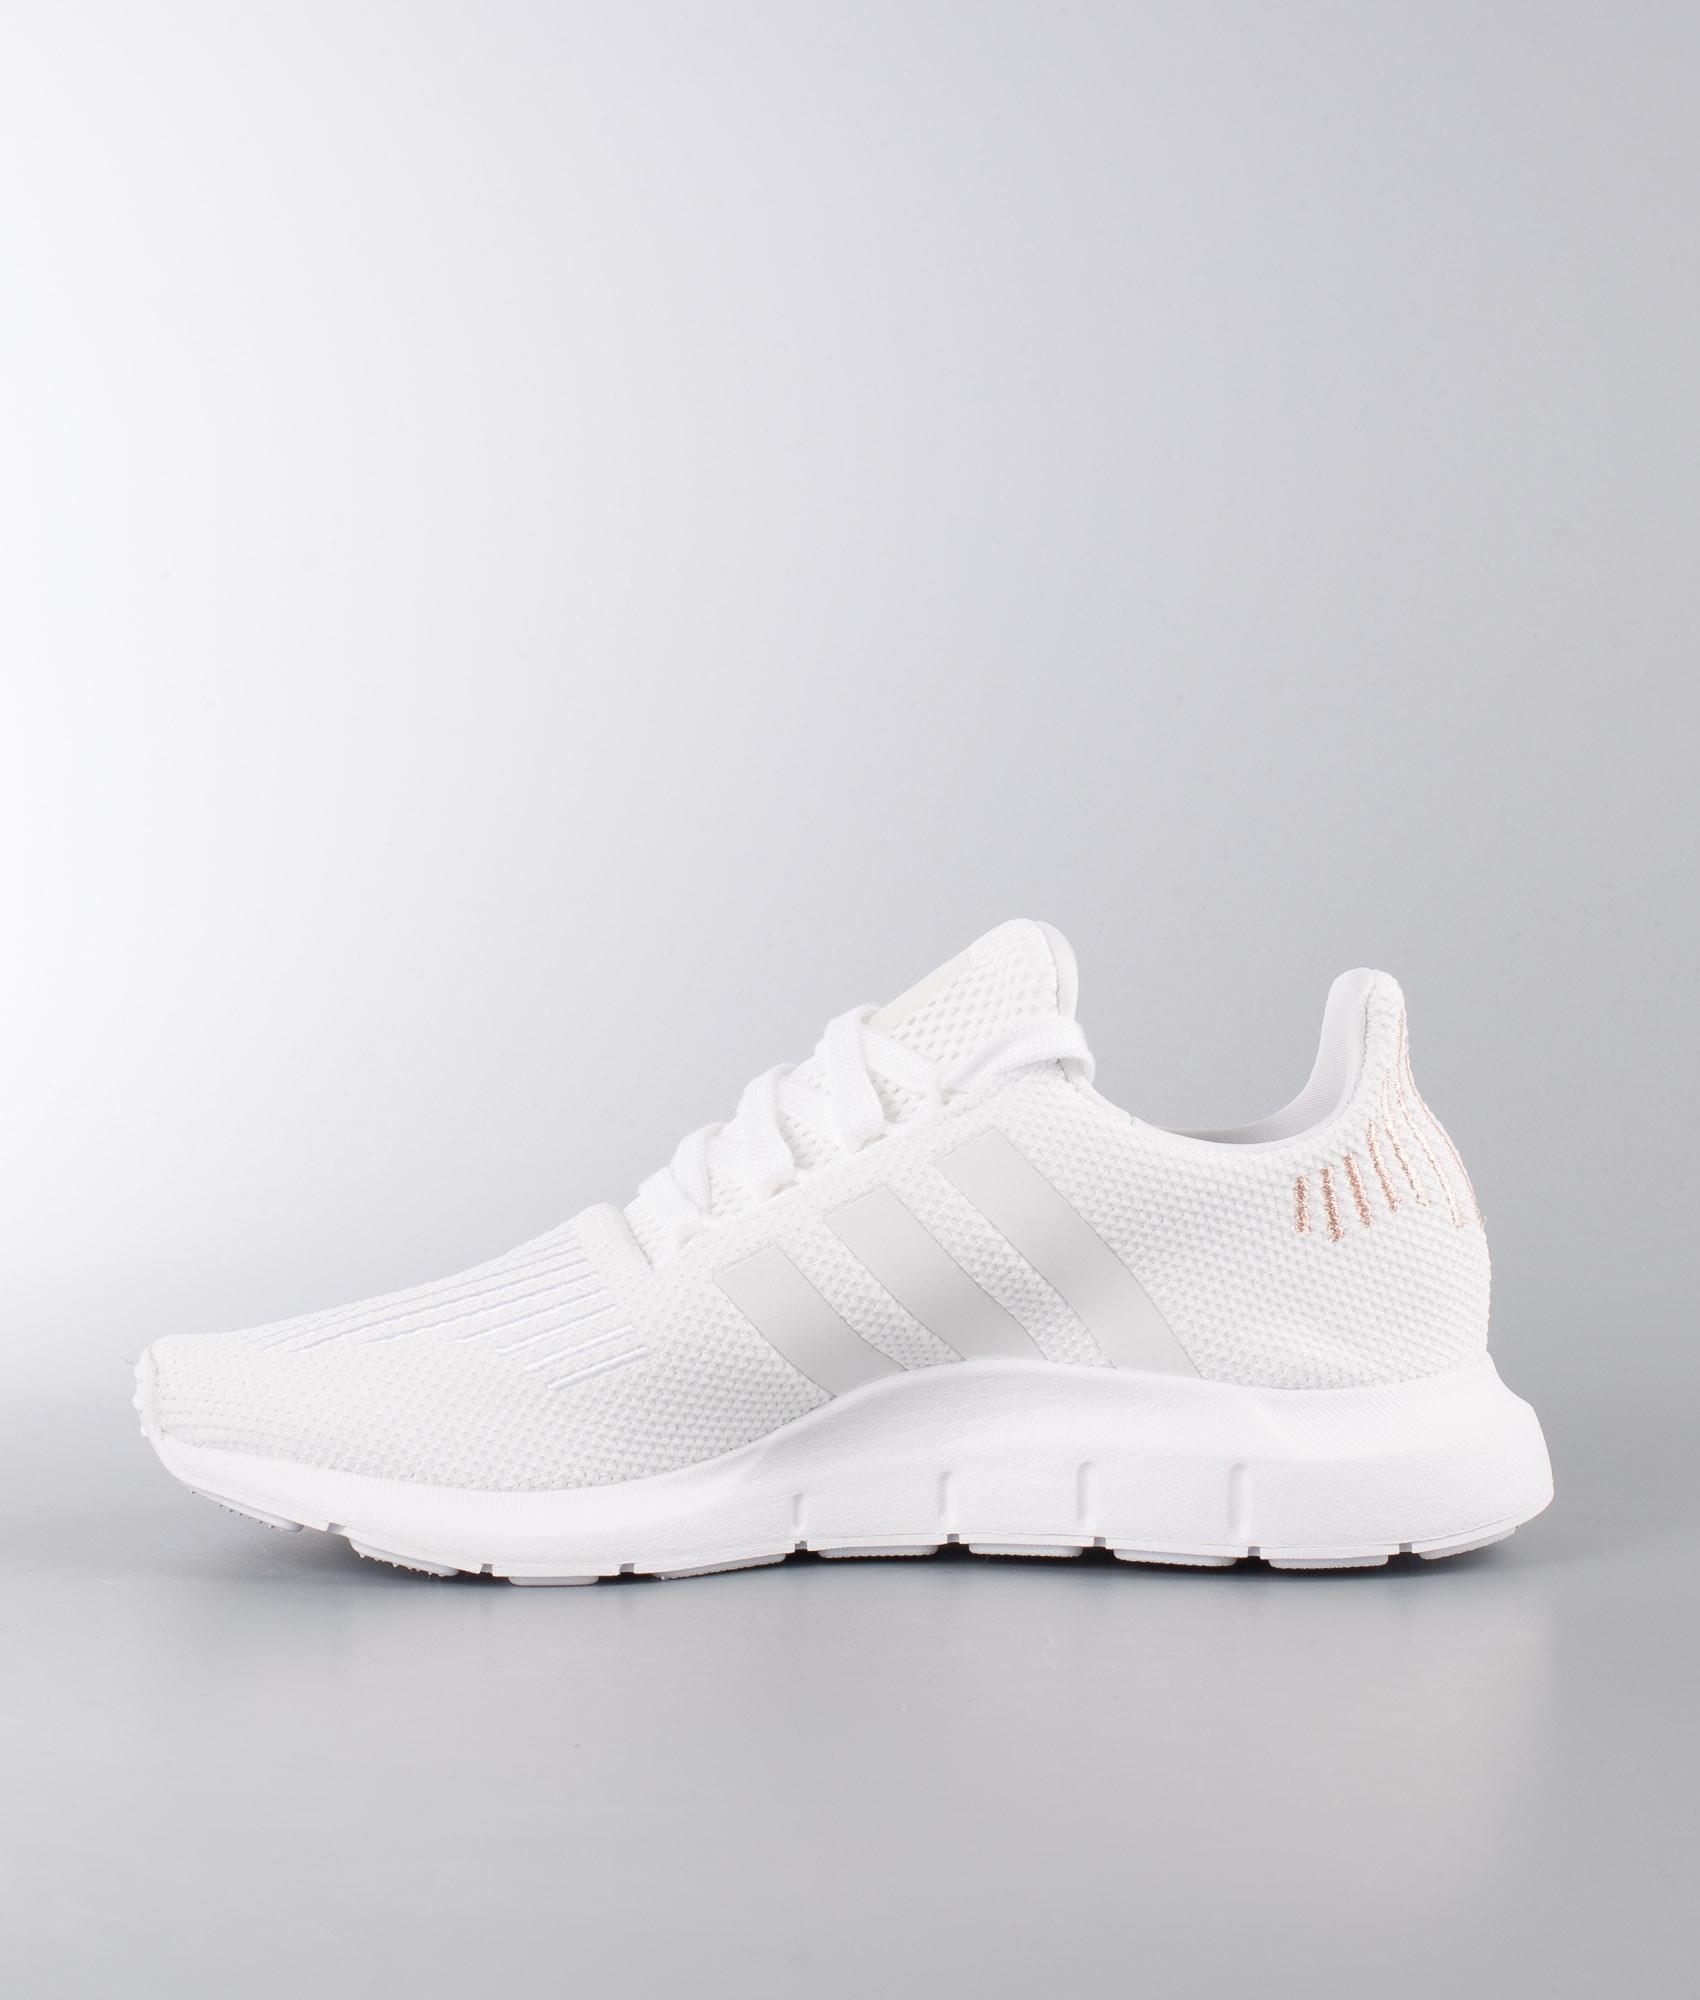 Adidas Originals Swift Run W Shoes Ftwr White Crywht Ftwr White